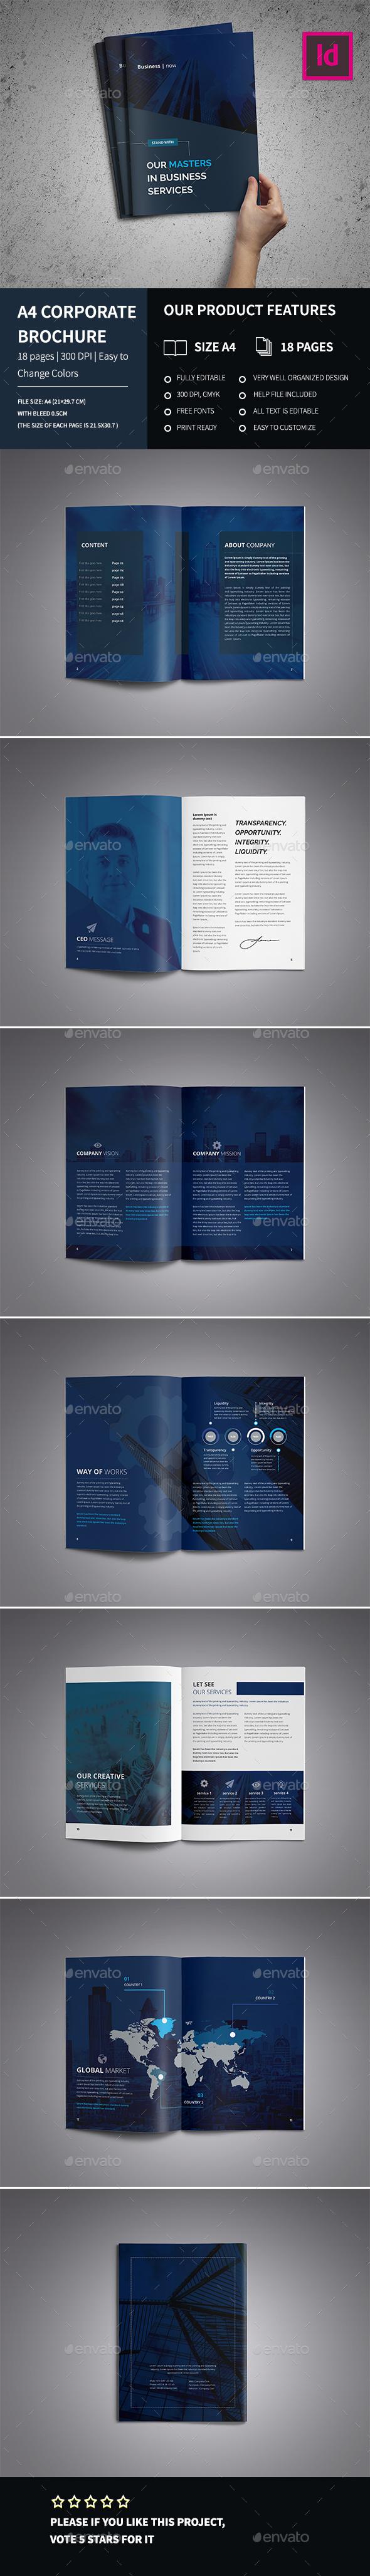 A4 Corporate Business Brochure Indd - Corporate Brochures